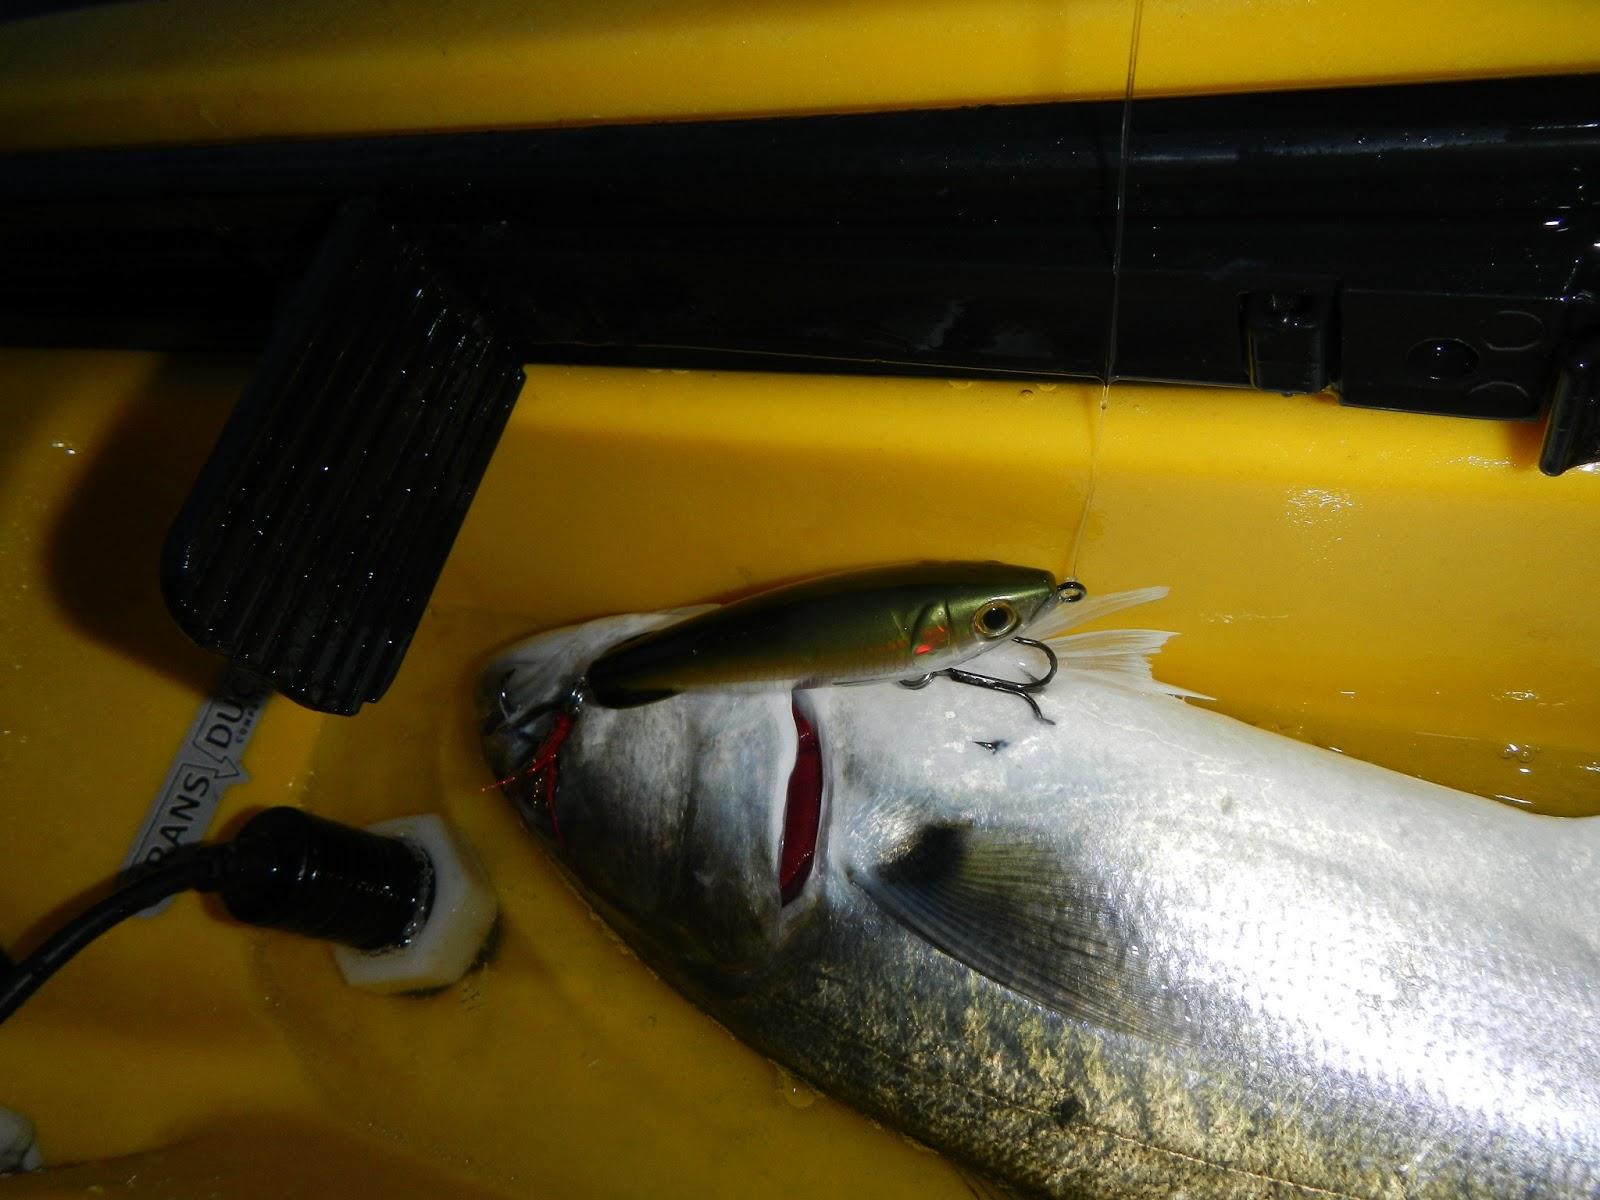 Makoslayer report rudee inlet 26apr13 for Rudee inlet fishing